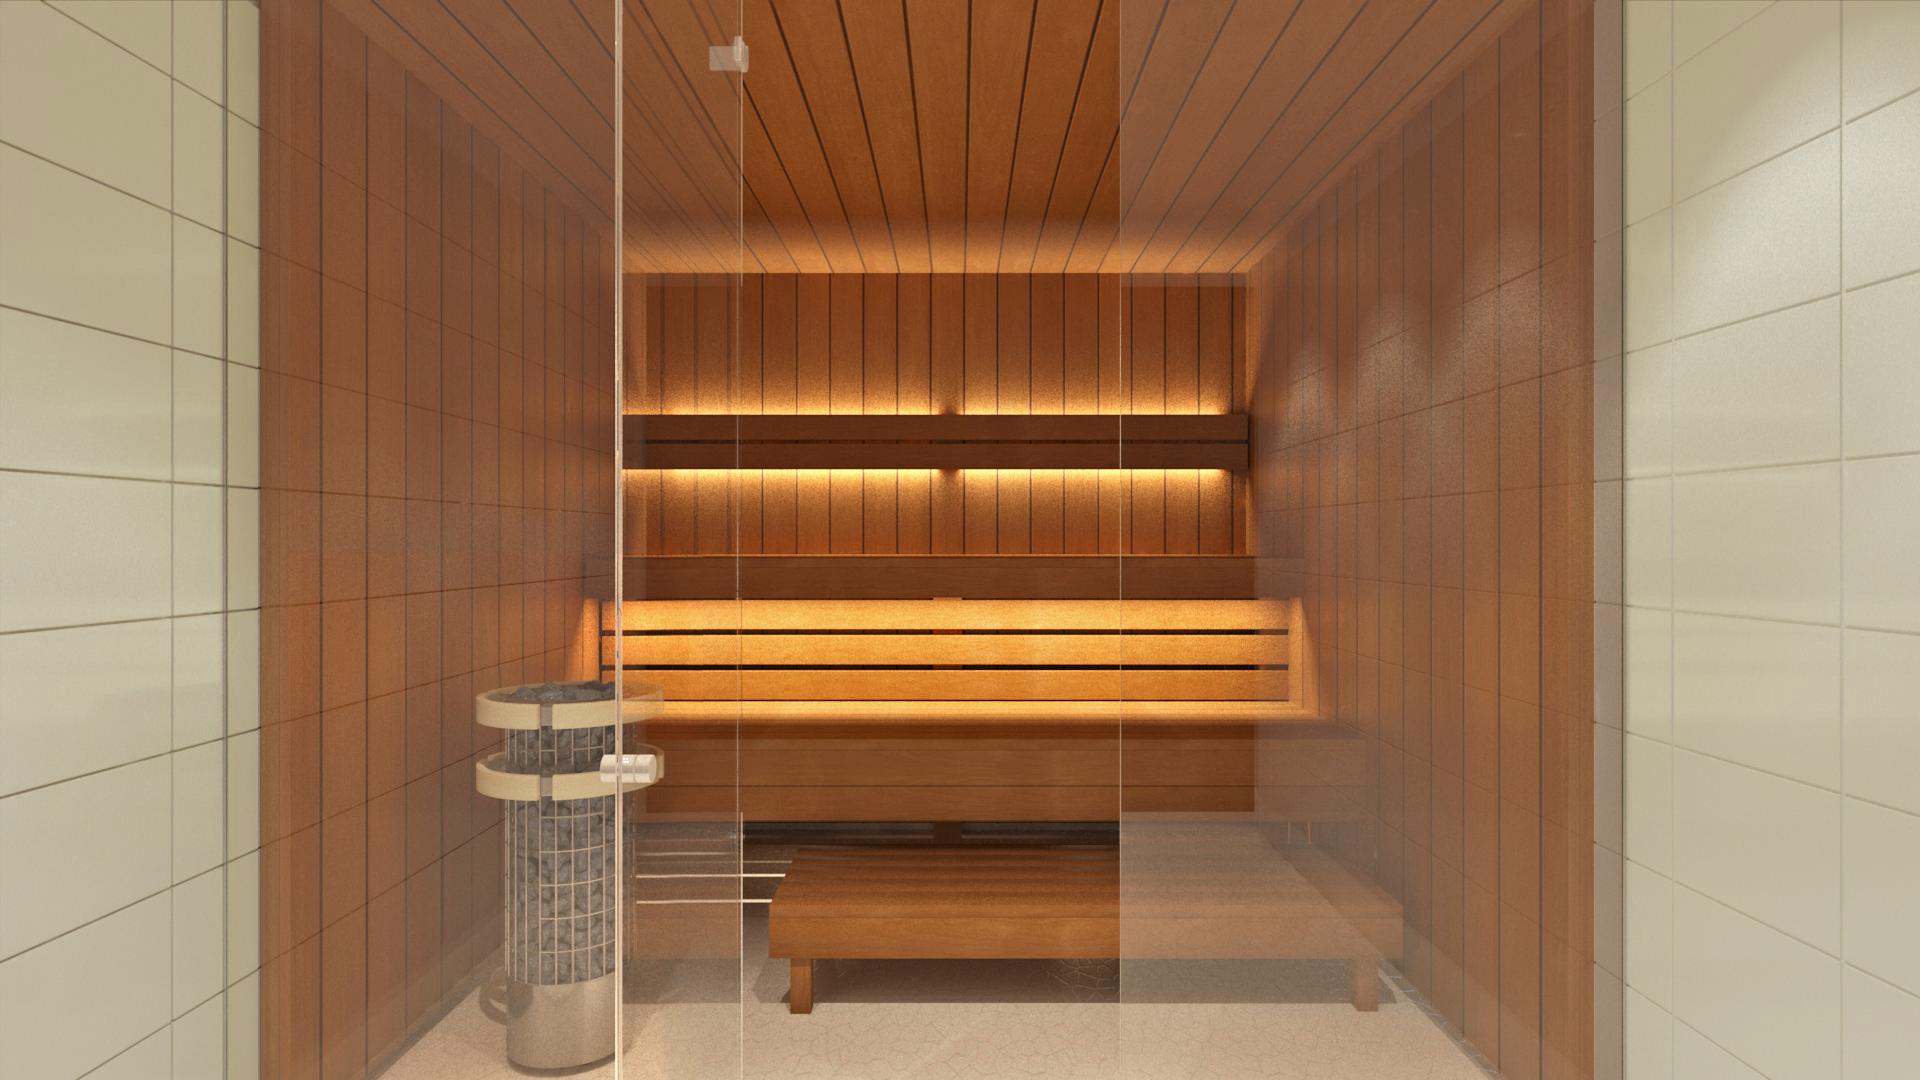 cilinder1-saun-saunamaailm